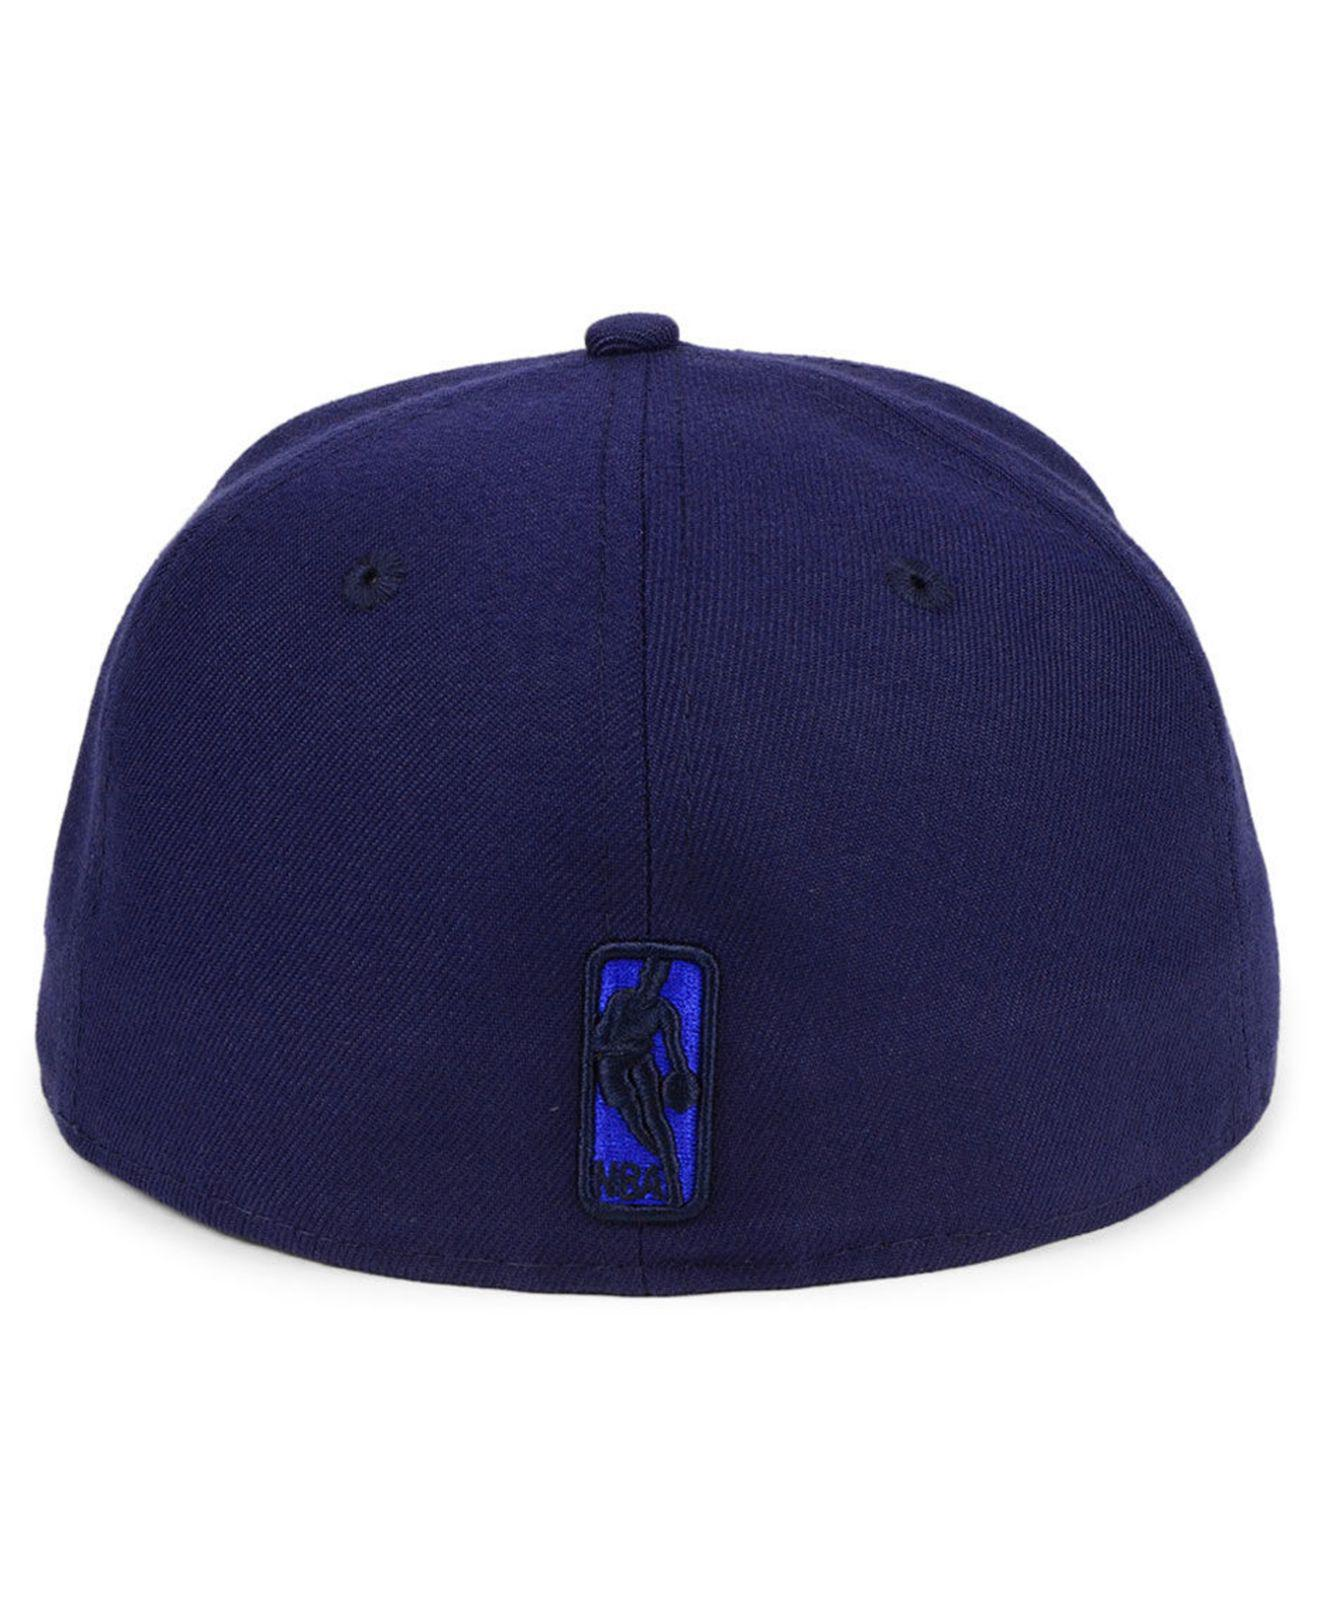 quality design fabef 8bc29 KTZ Boston Celtics Color Prism Pack 59fifty Cap in Blue for Men - Lyst